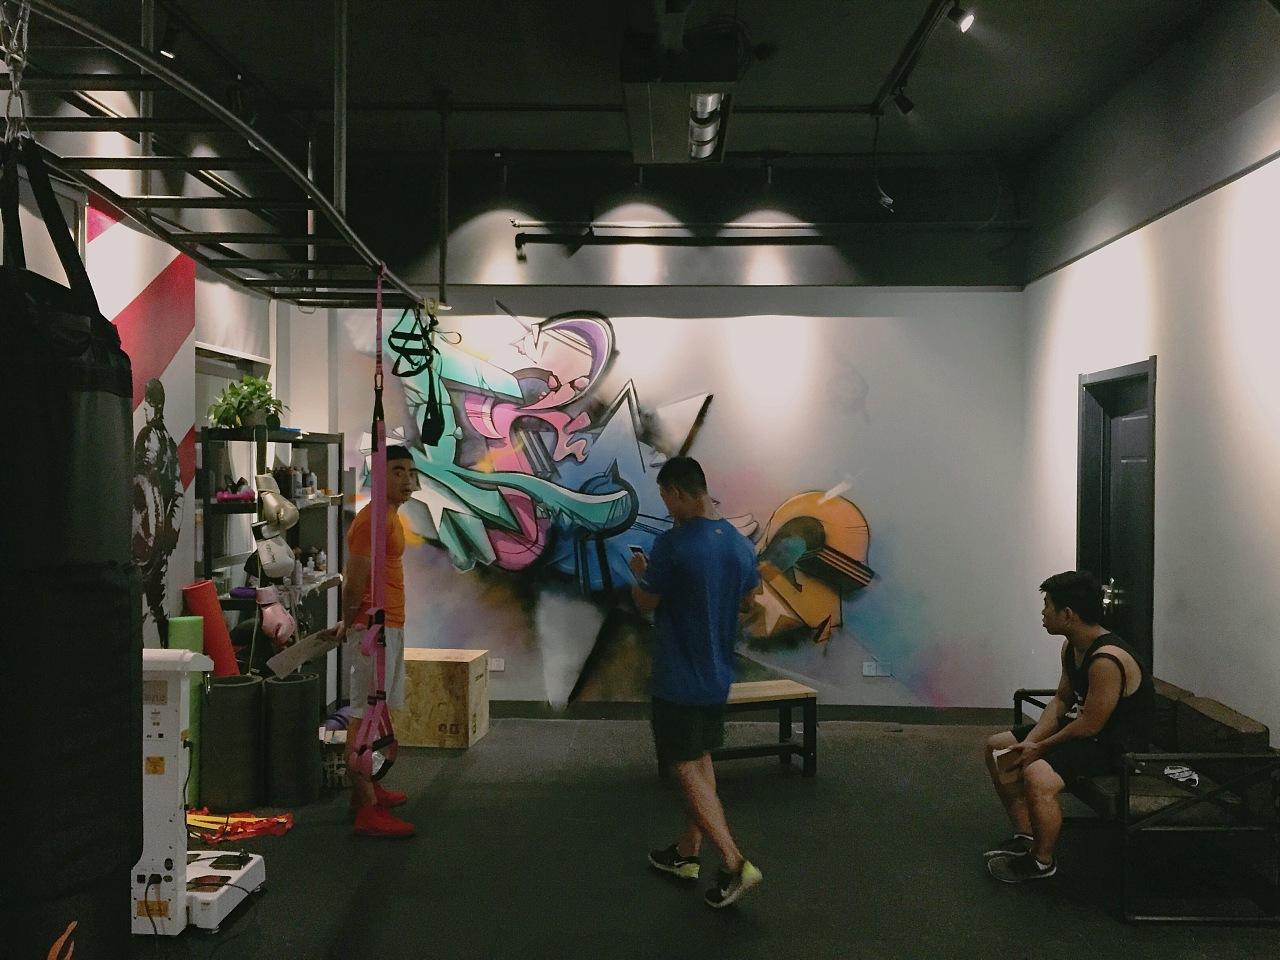 iron 健身房涂鸦墙绘(教程?)